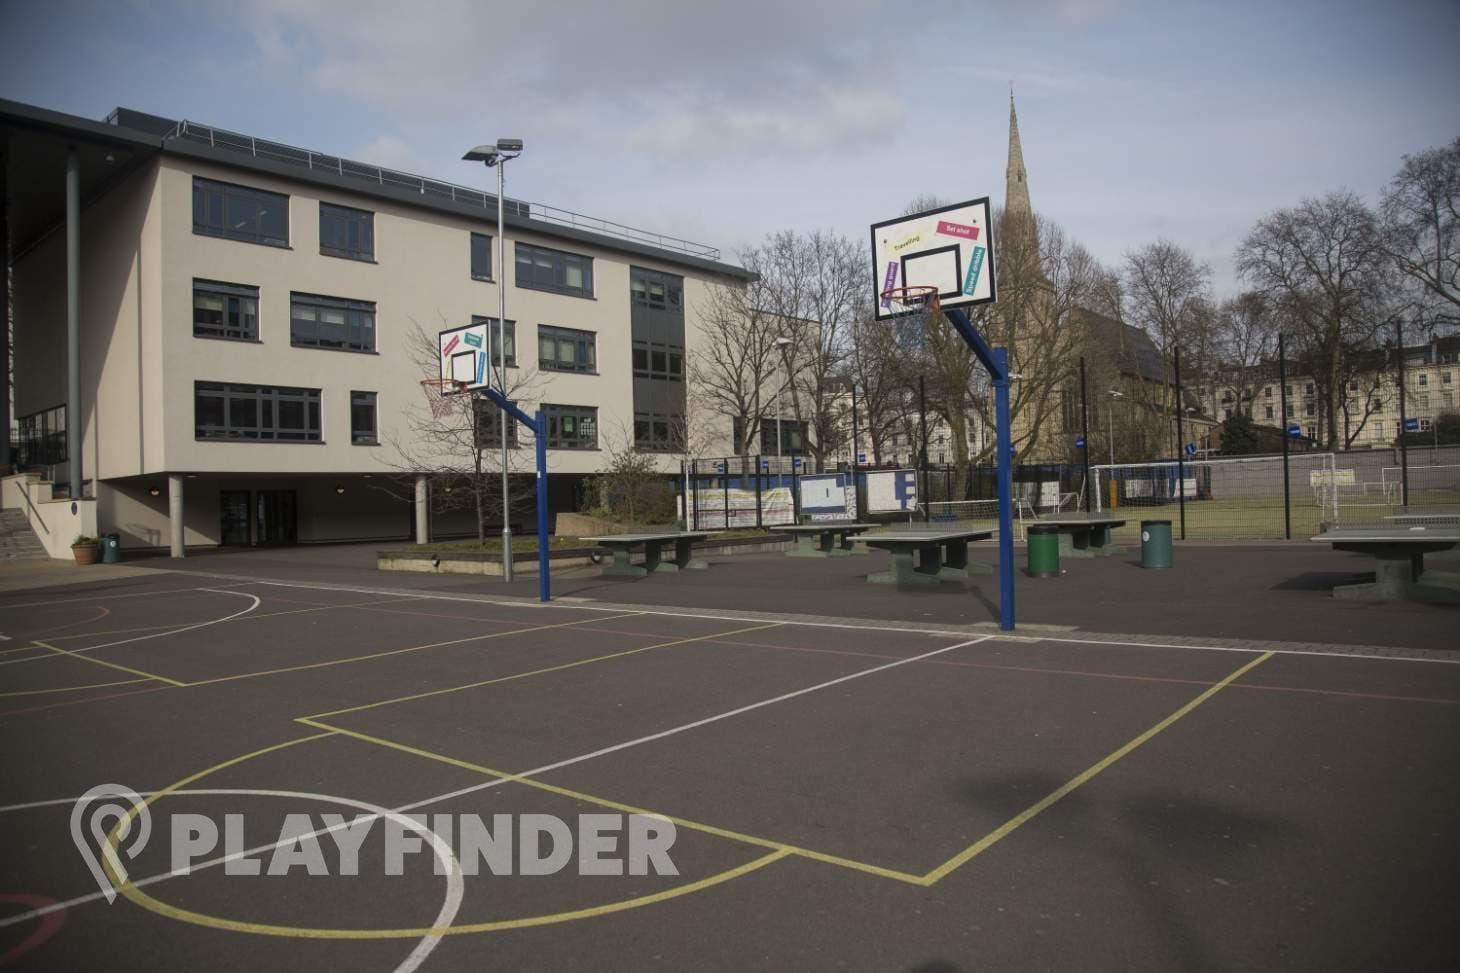 Pimlico Academy School